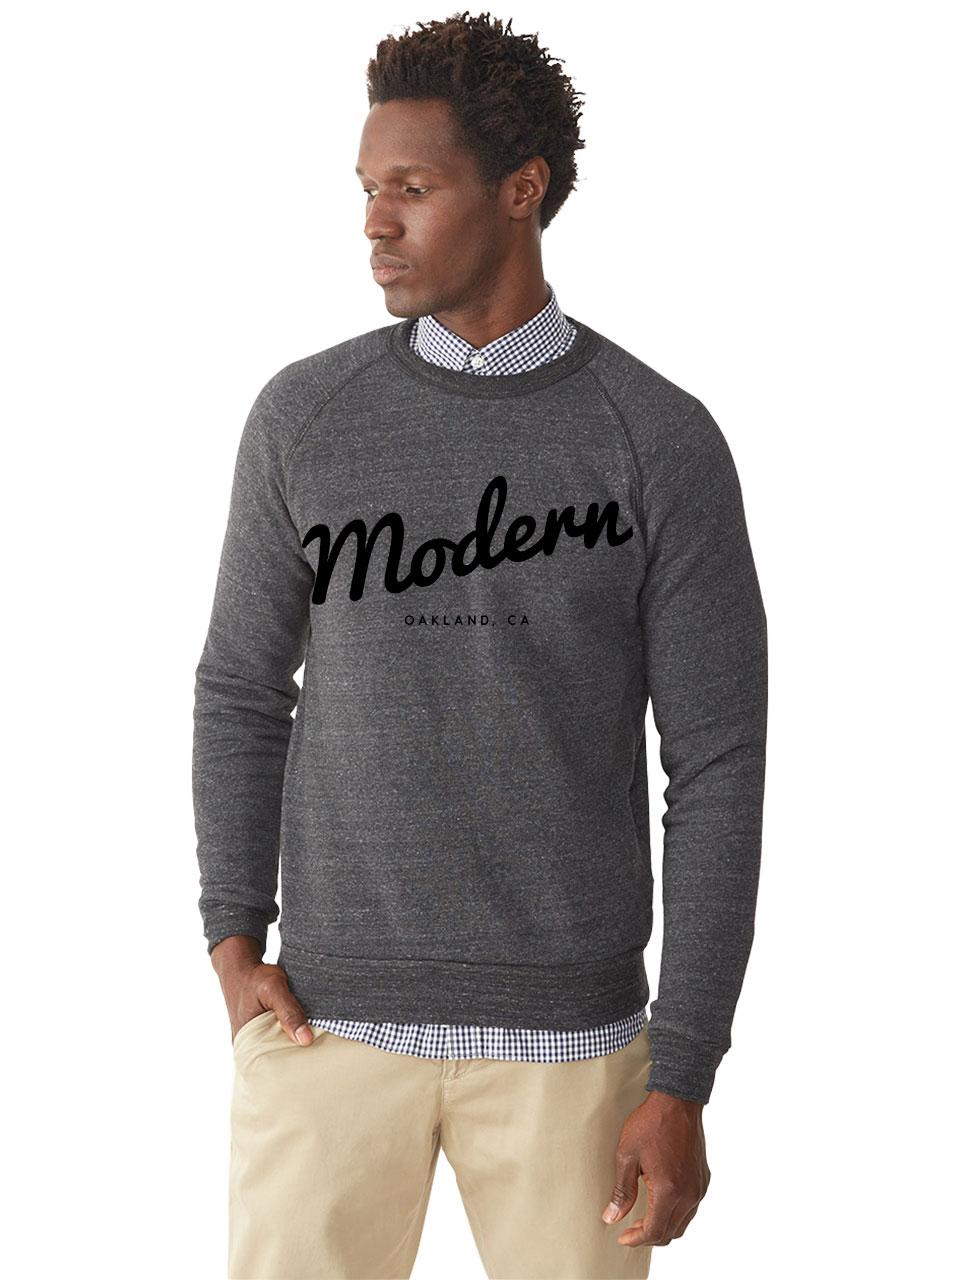 sweatshirt_mockup-R3-A-Black